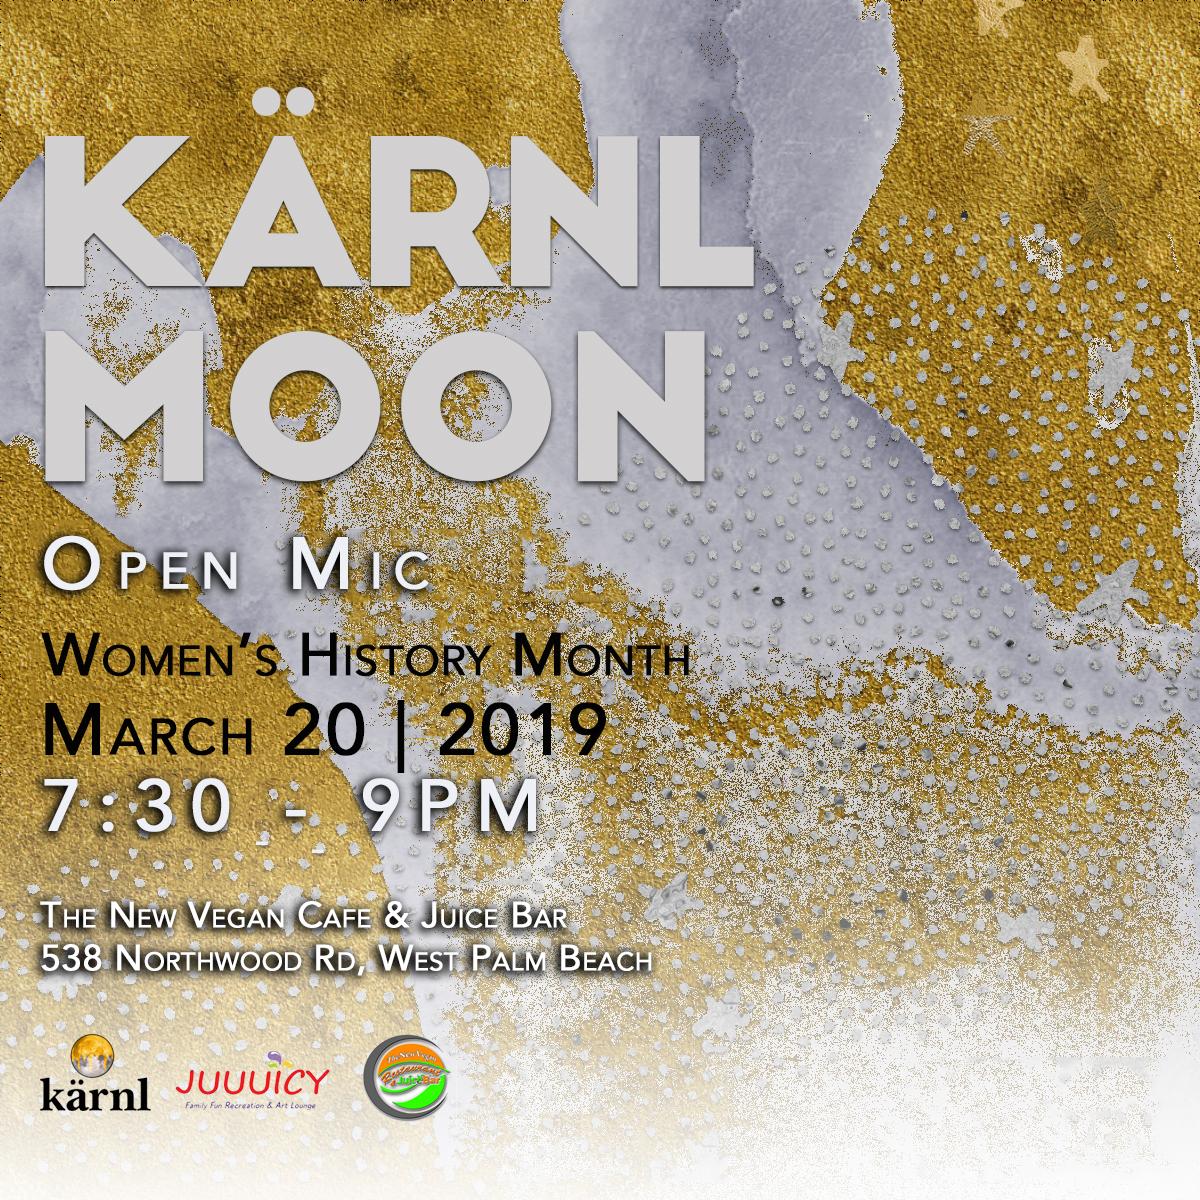 Karnl-Moon-March-OM-with-logos.jpg